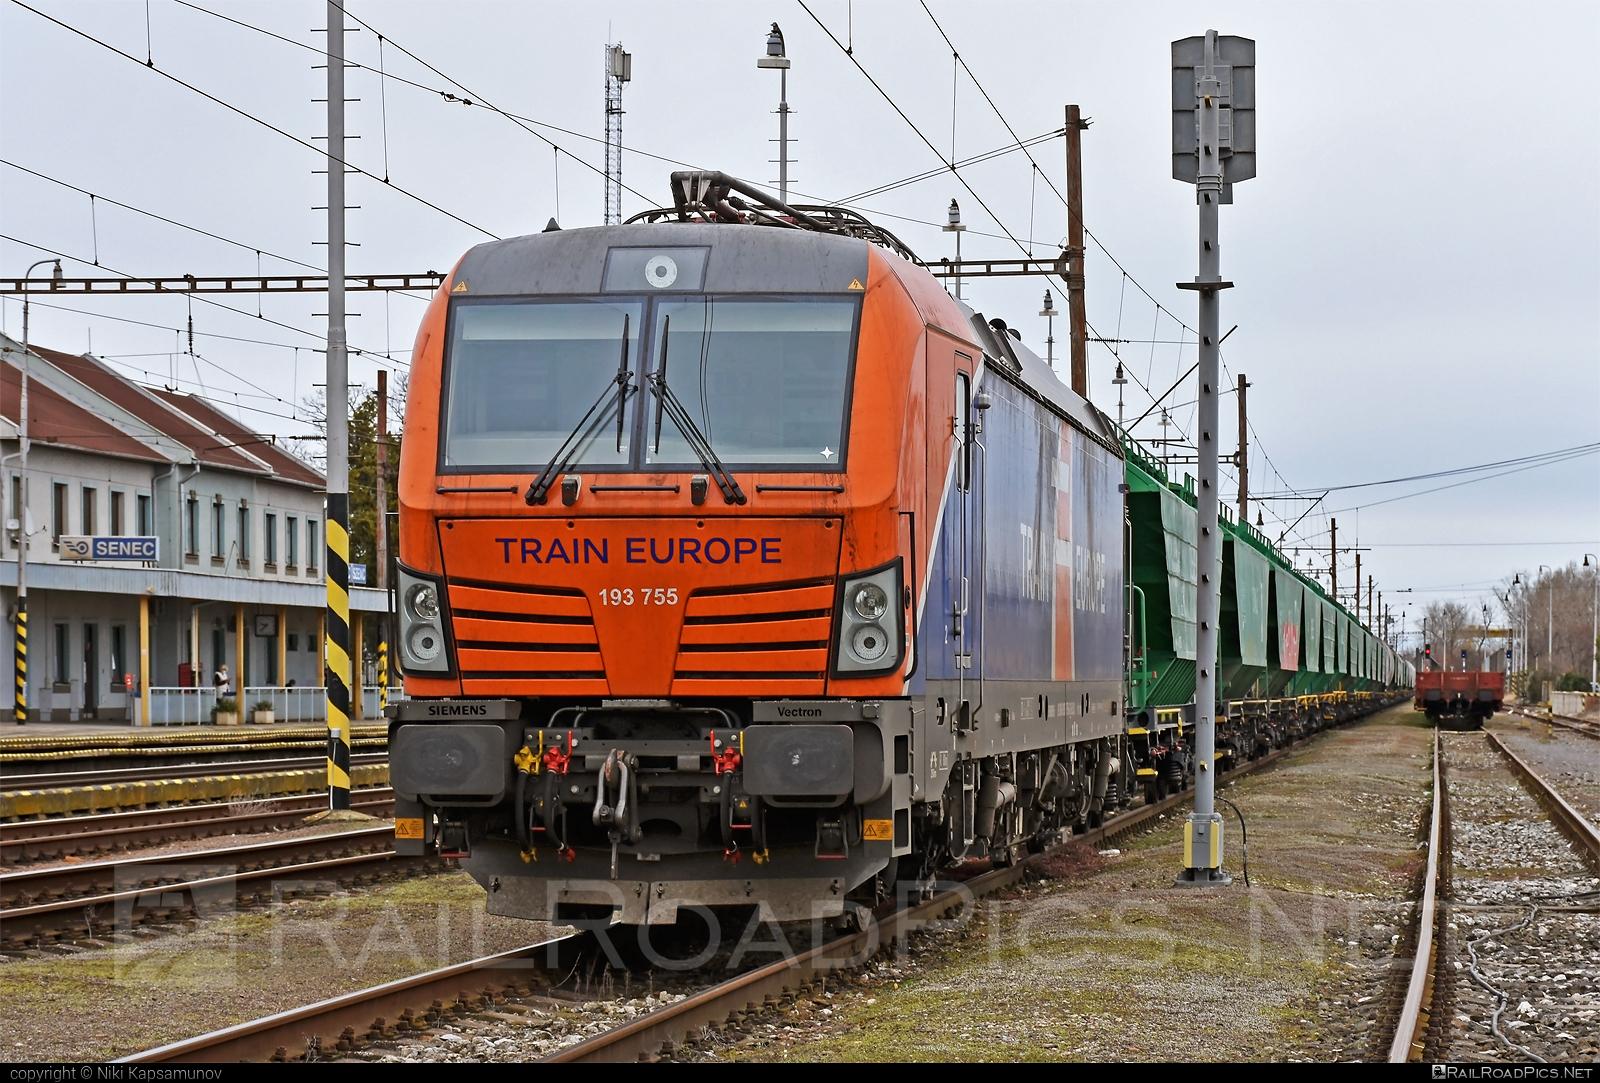 Siemens Vectron MS - 193 755 operated by LOKORAIL, a.s. #ell #ellgermany #eloc #europeanlocomotiveleasing #hopperwagon #lokorail #lrl #siemens #siemensvectron #siemensvectronms #traineurope #vectron #vectronms